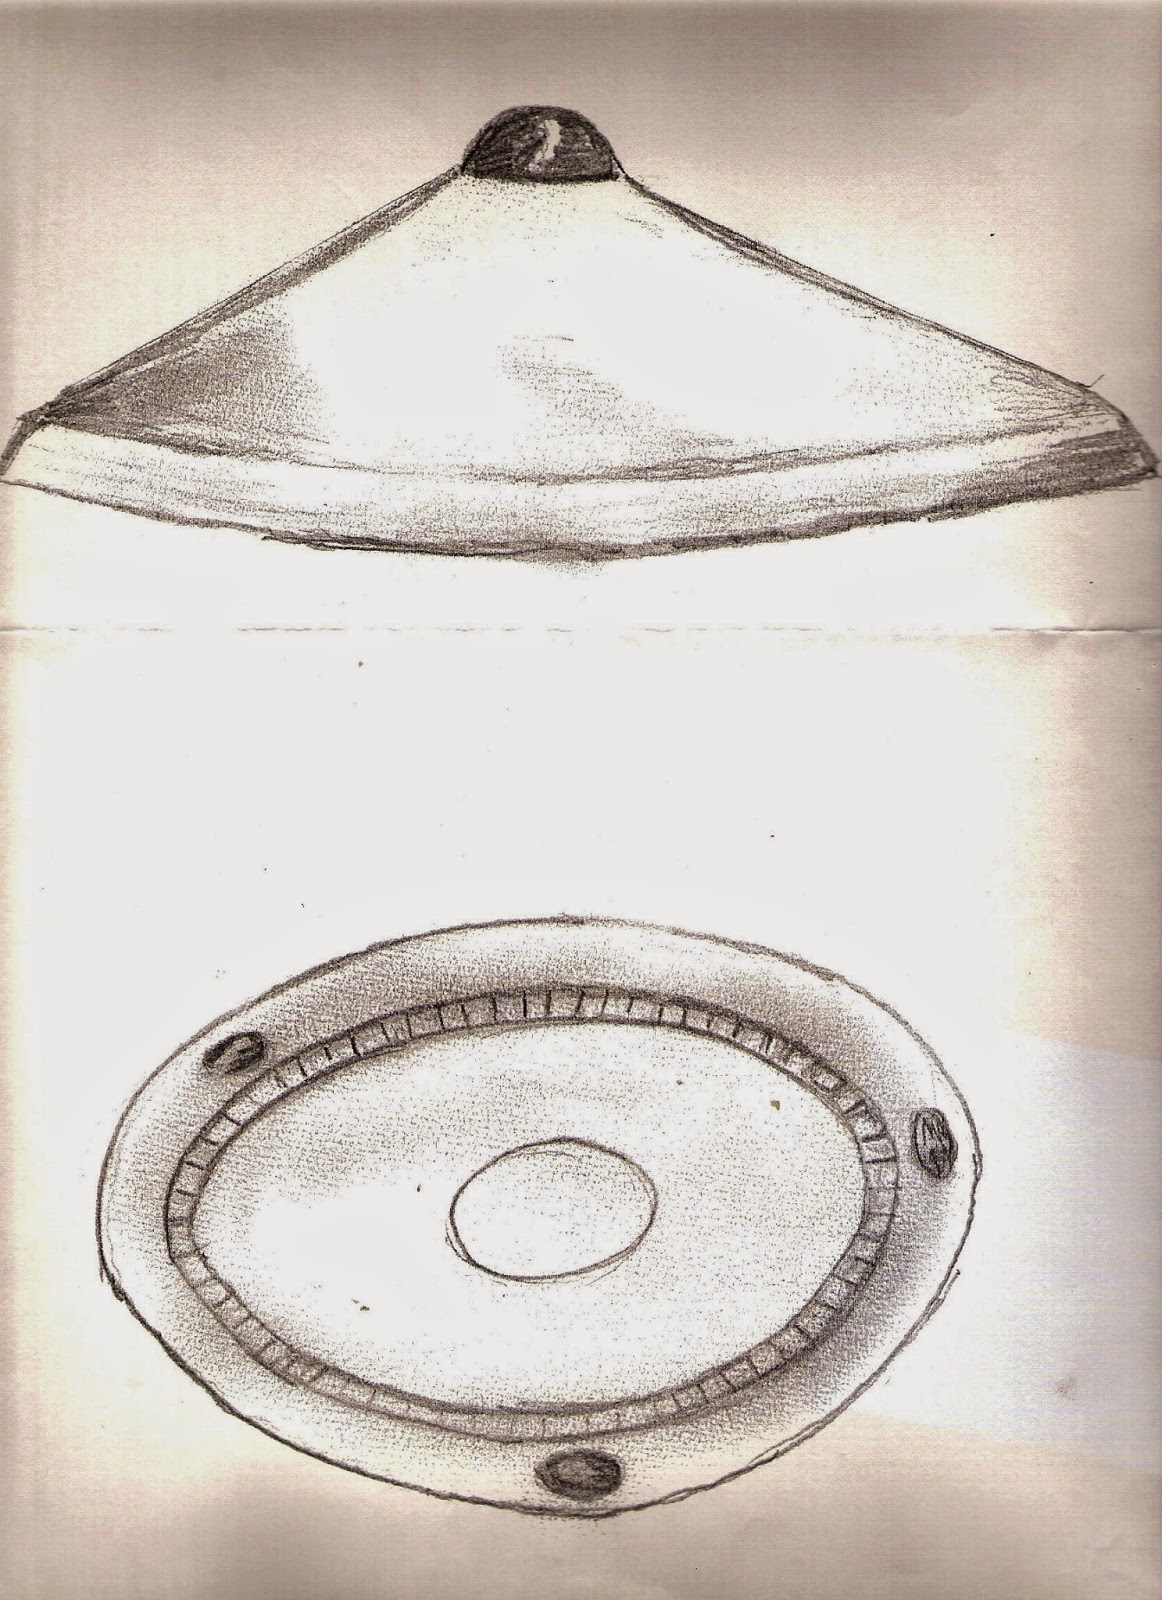 Copy of Victor Zakruzny's illustration of the Westall UFO